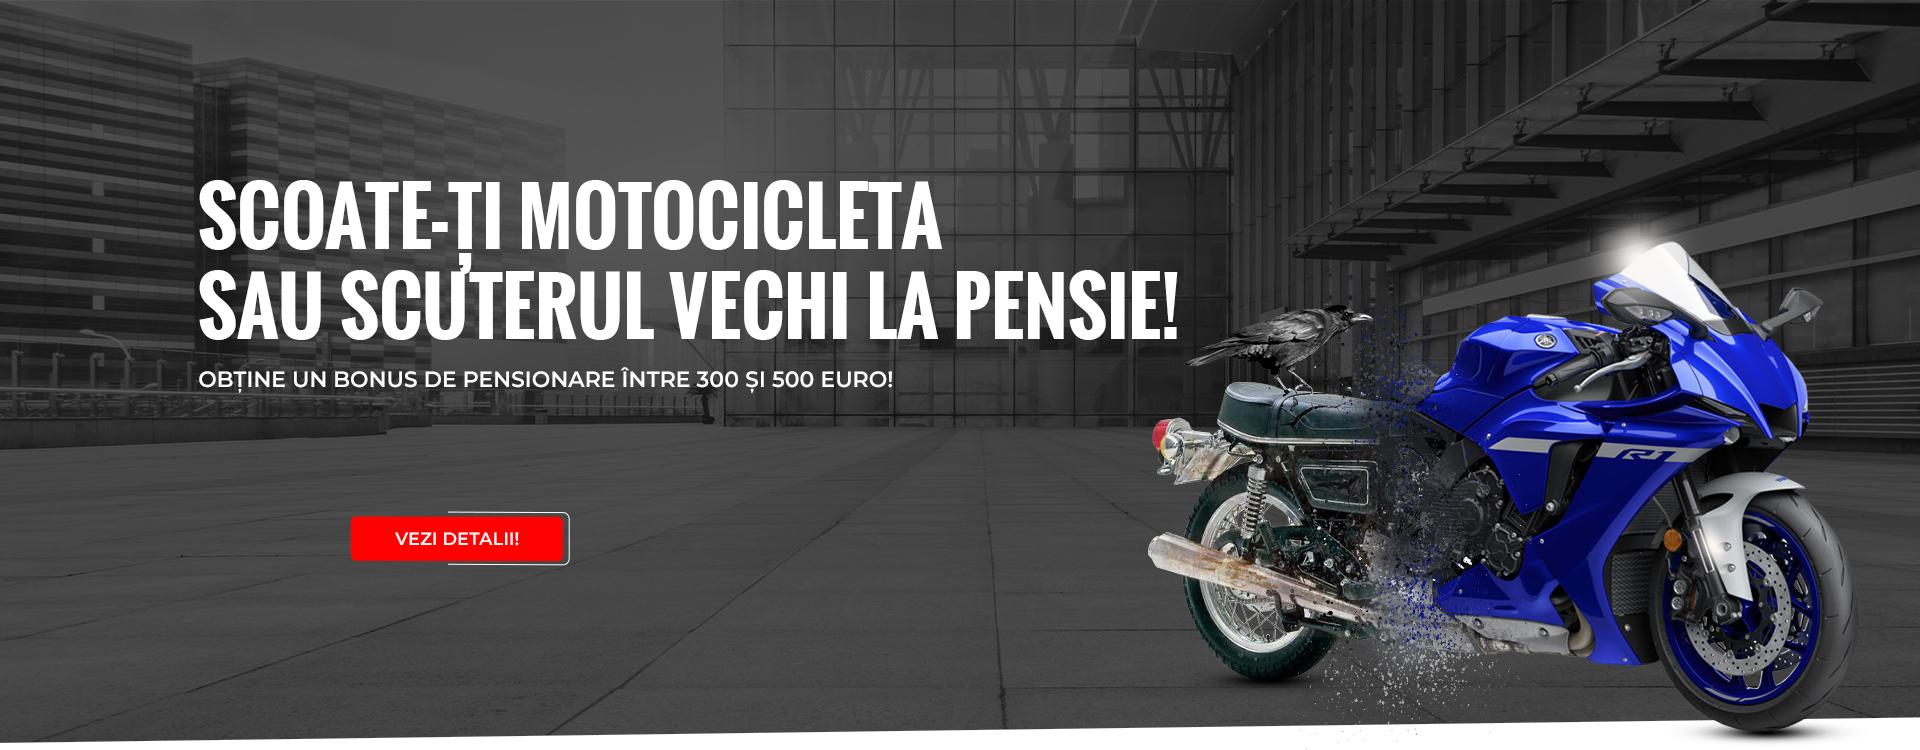 Scoate-ti motocicleta la pensie!